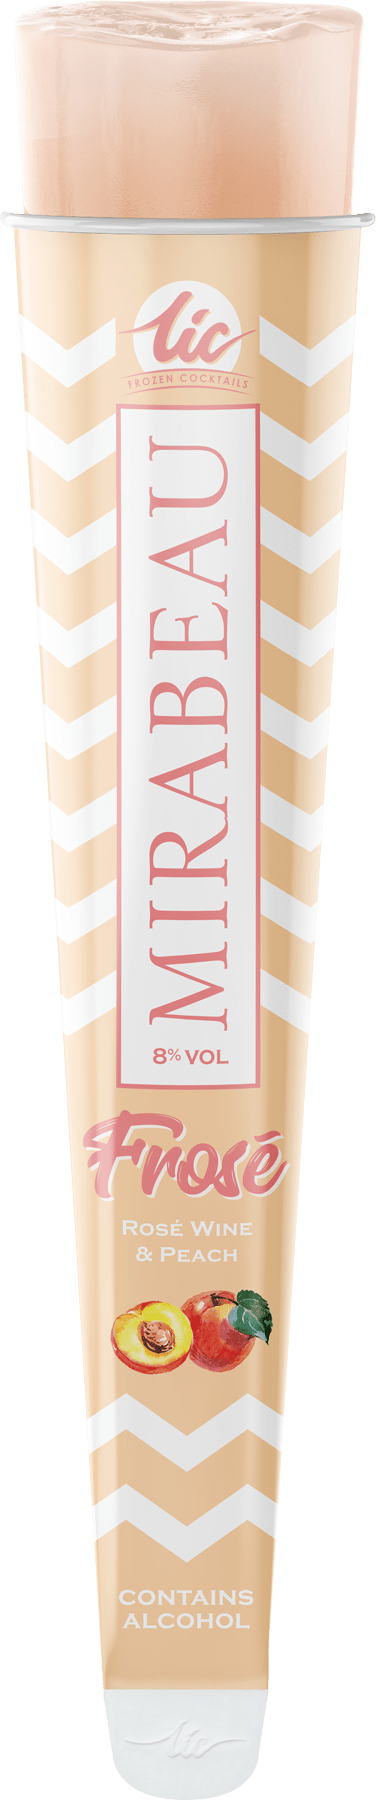 Peach Frosé: Mirabeau Wine